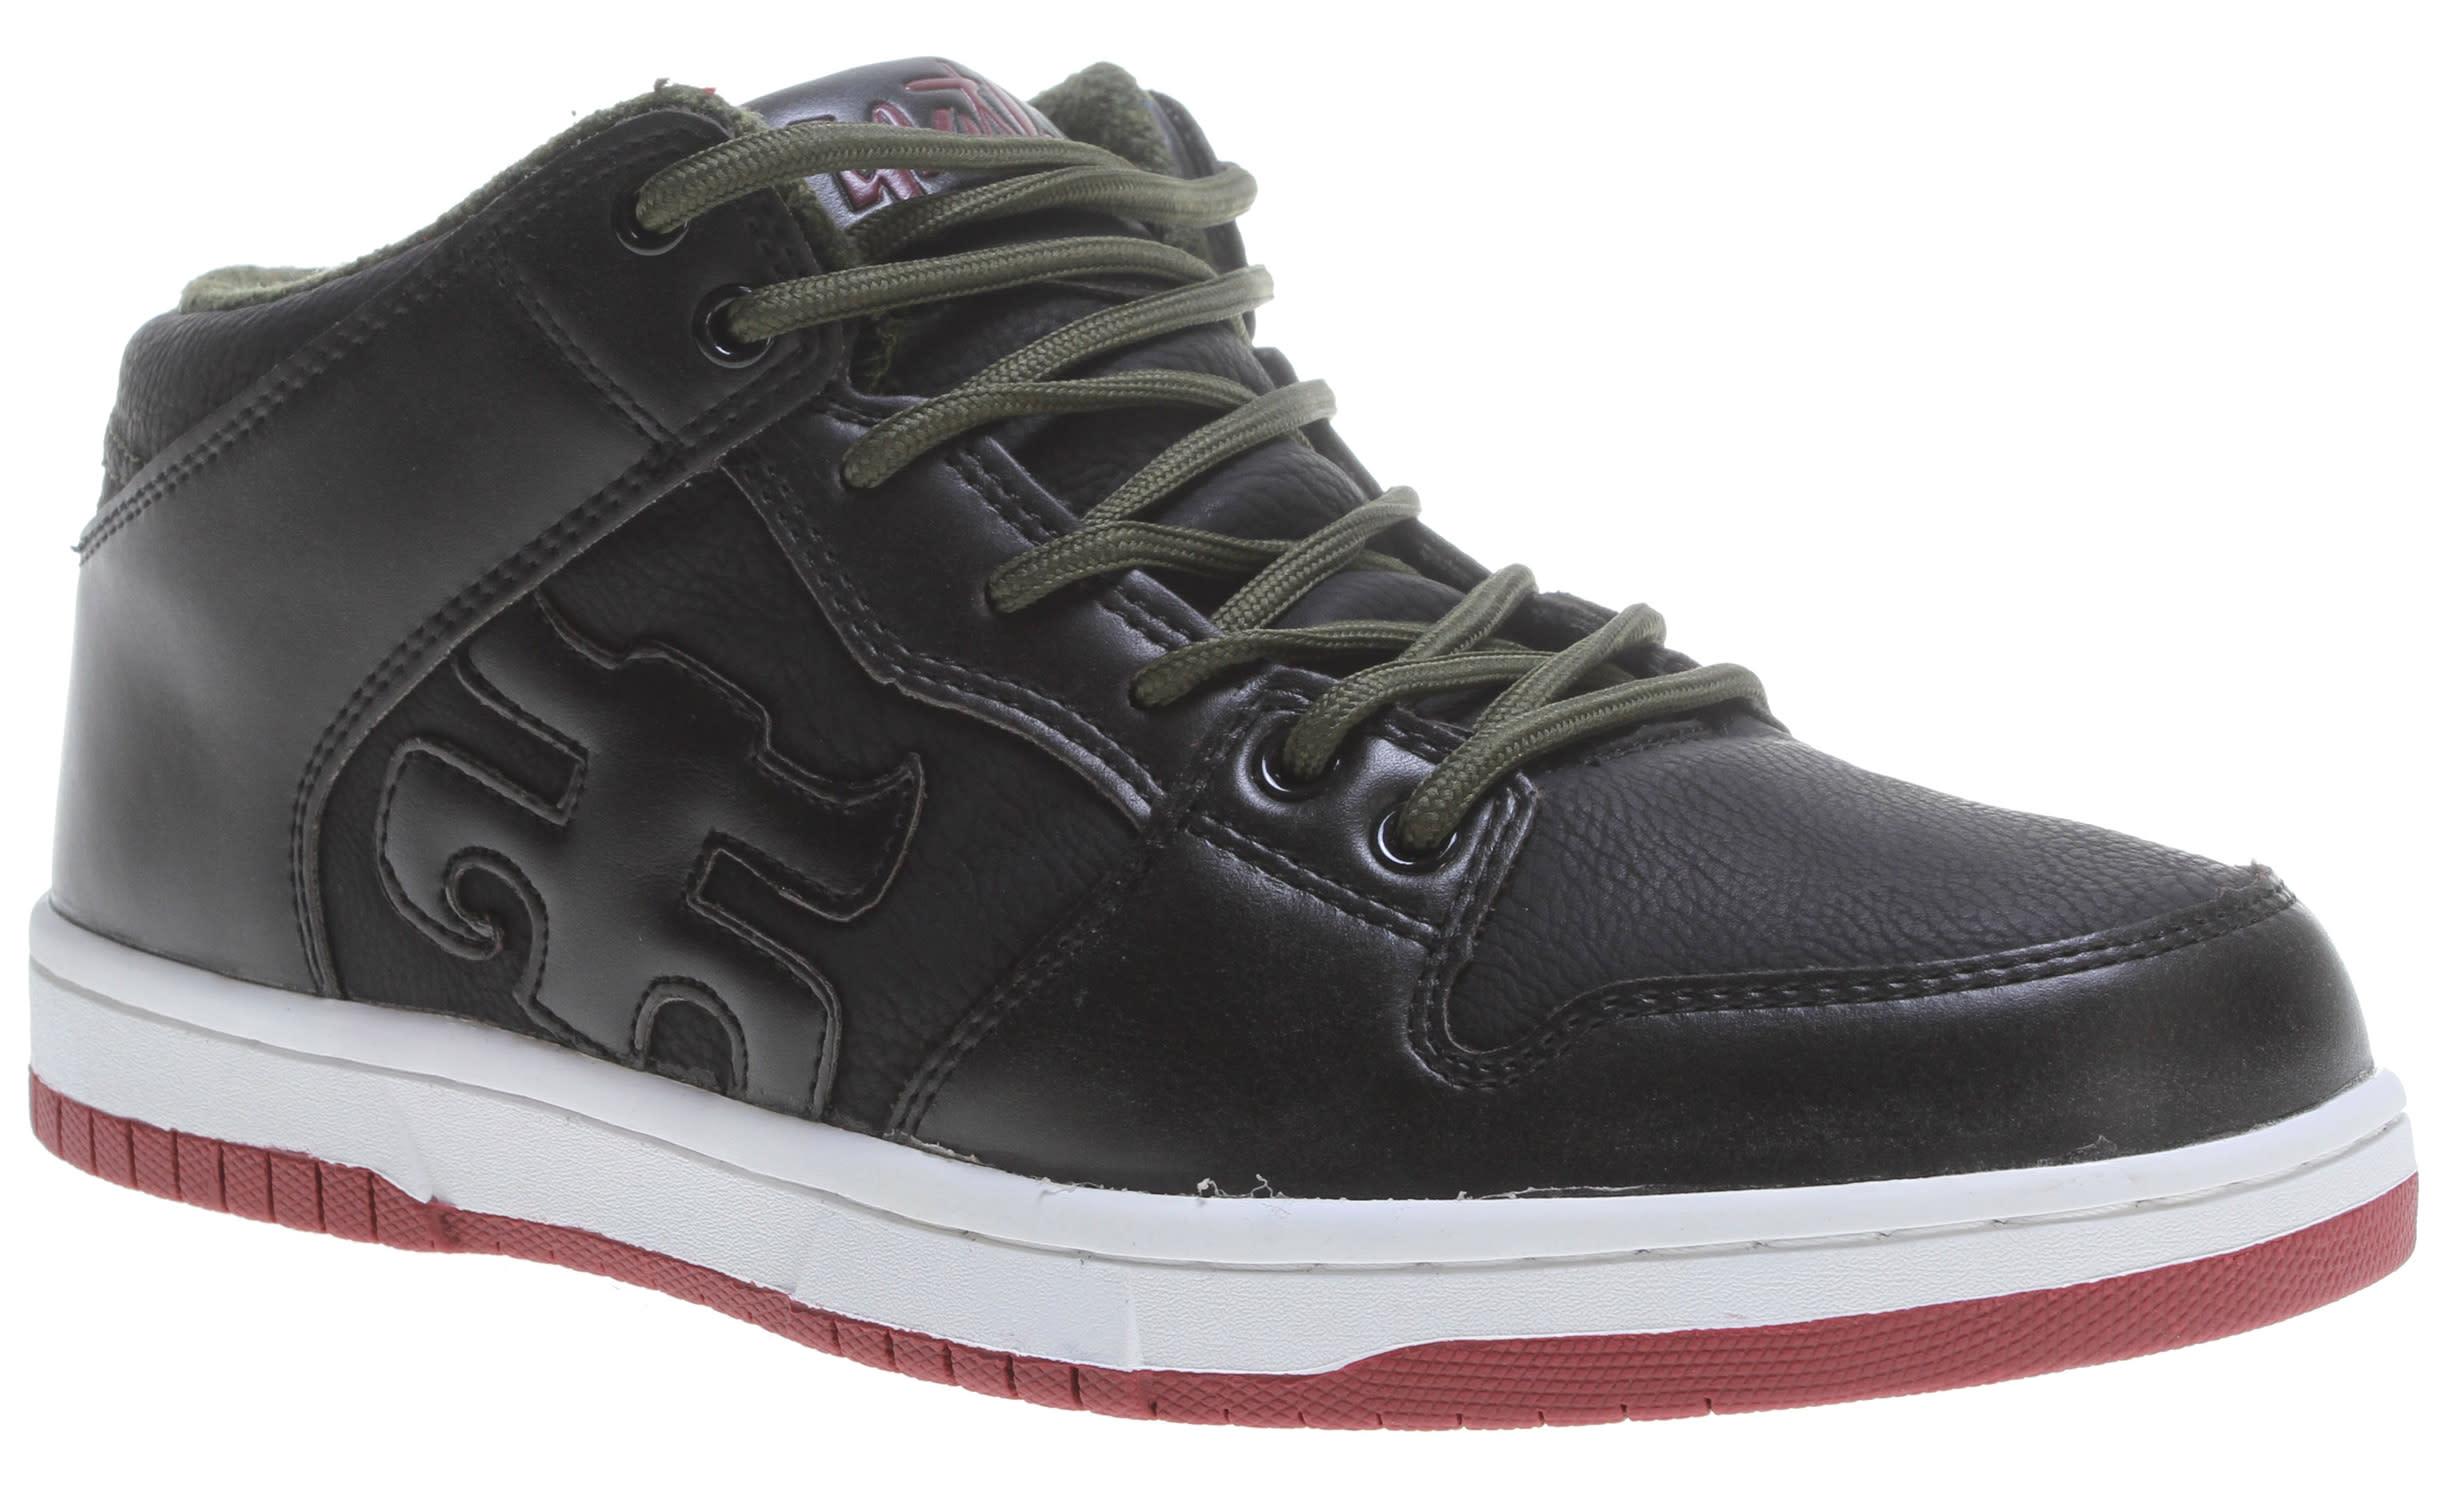 best loved b75c9 eb196 ... Ipath Grasshopper XT Skate Shoes - thumbnail 2 ...